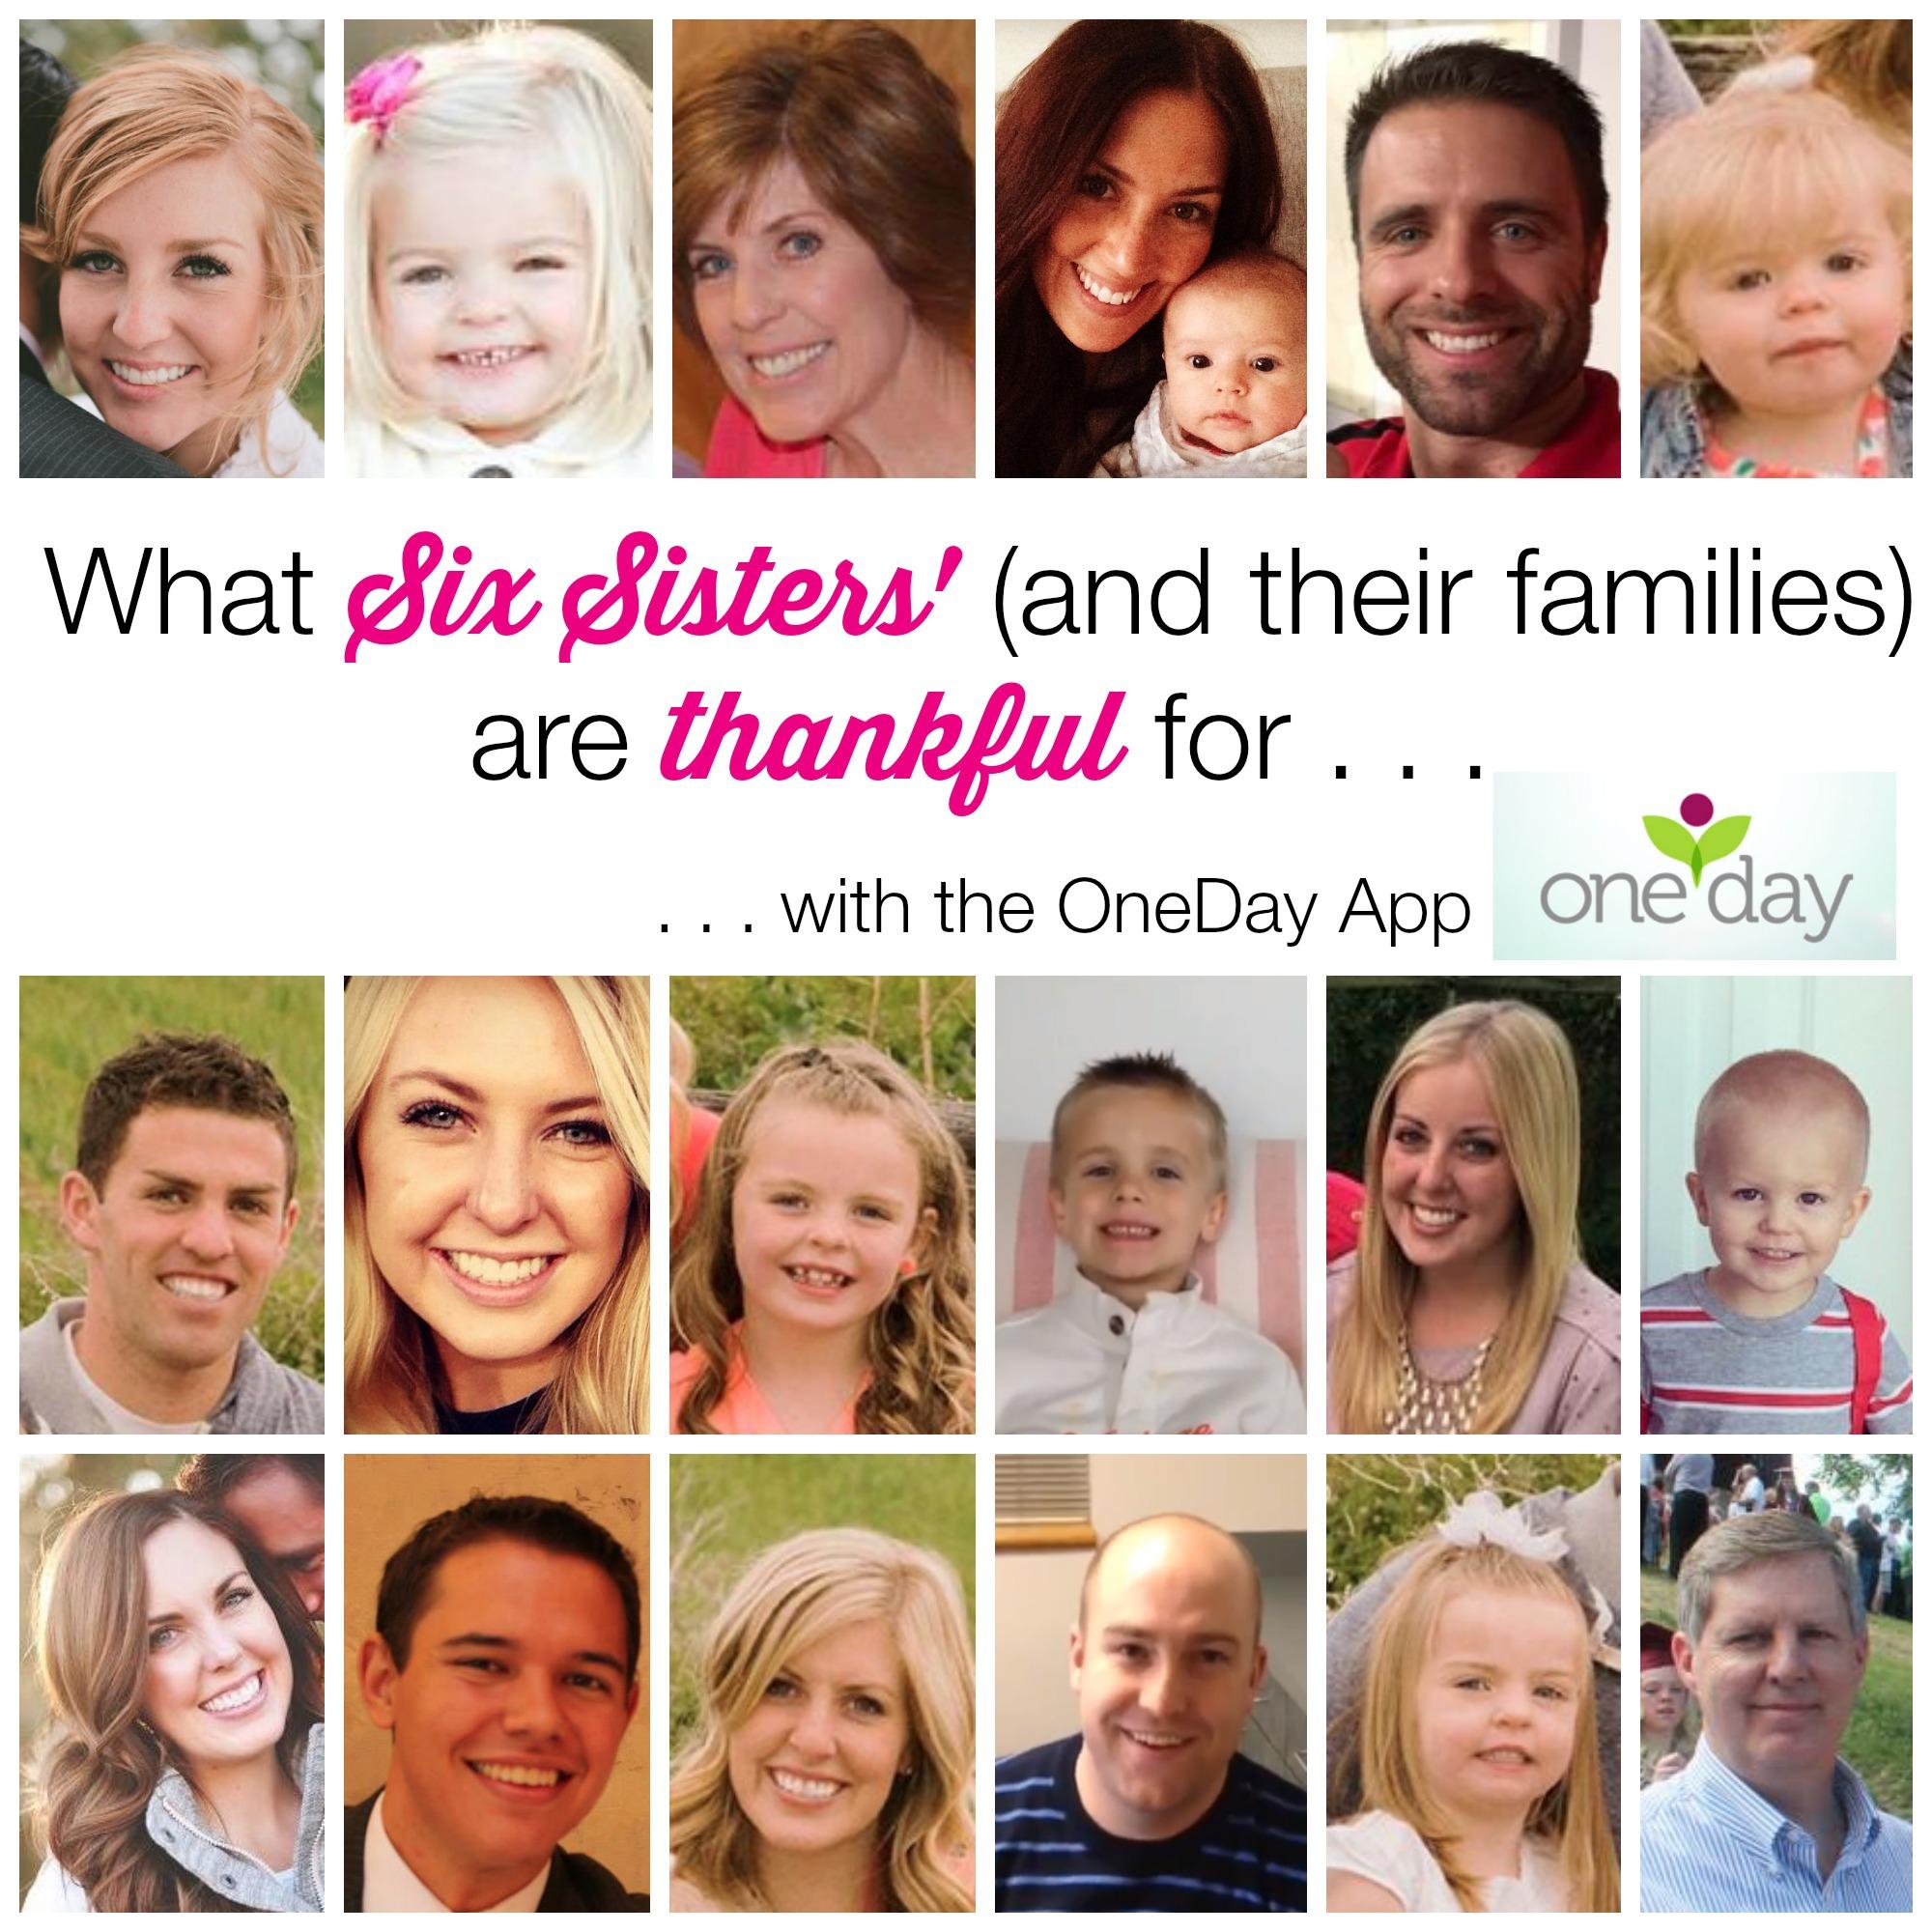 Six Sisters Thankful - OneDay App